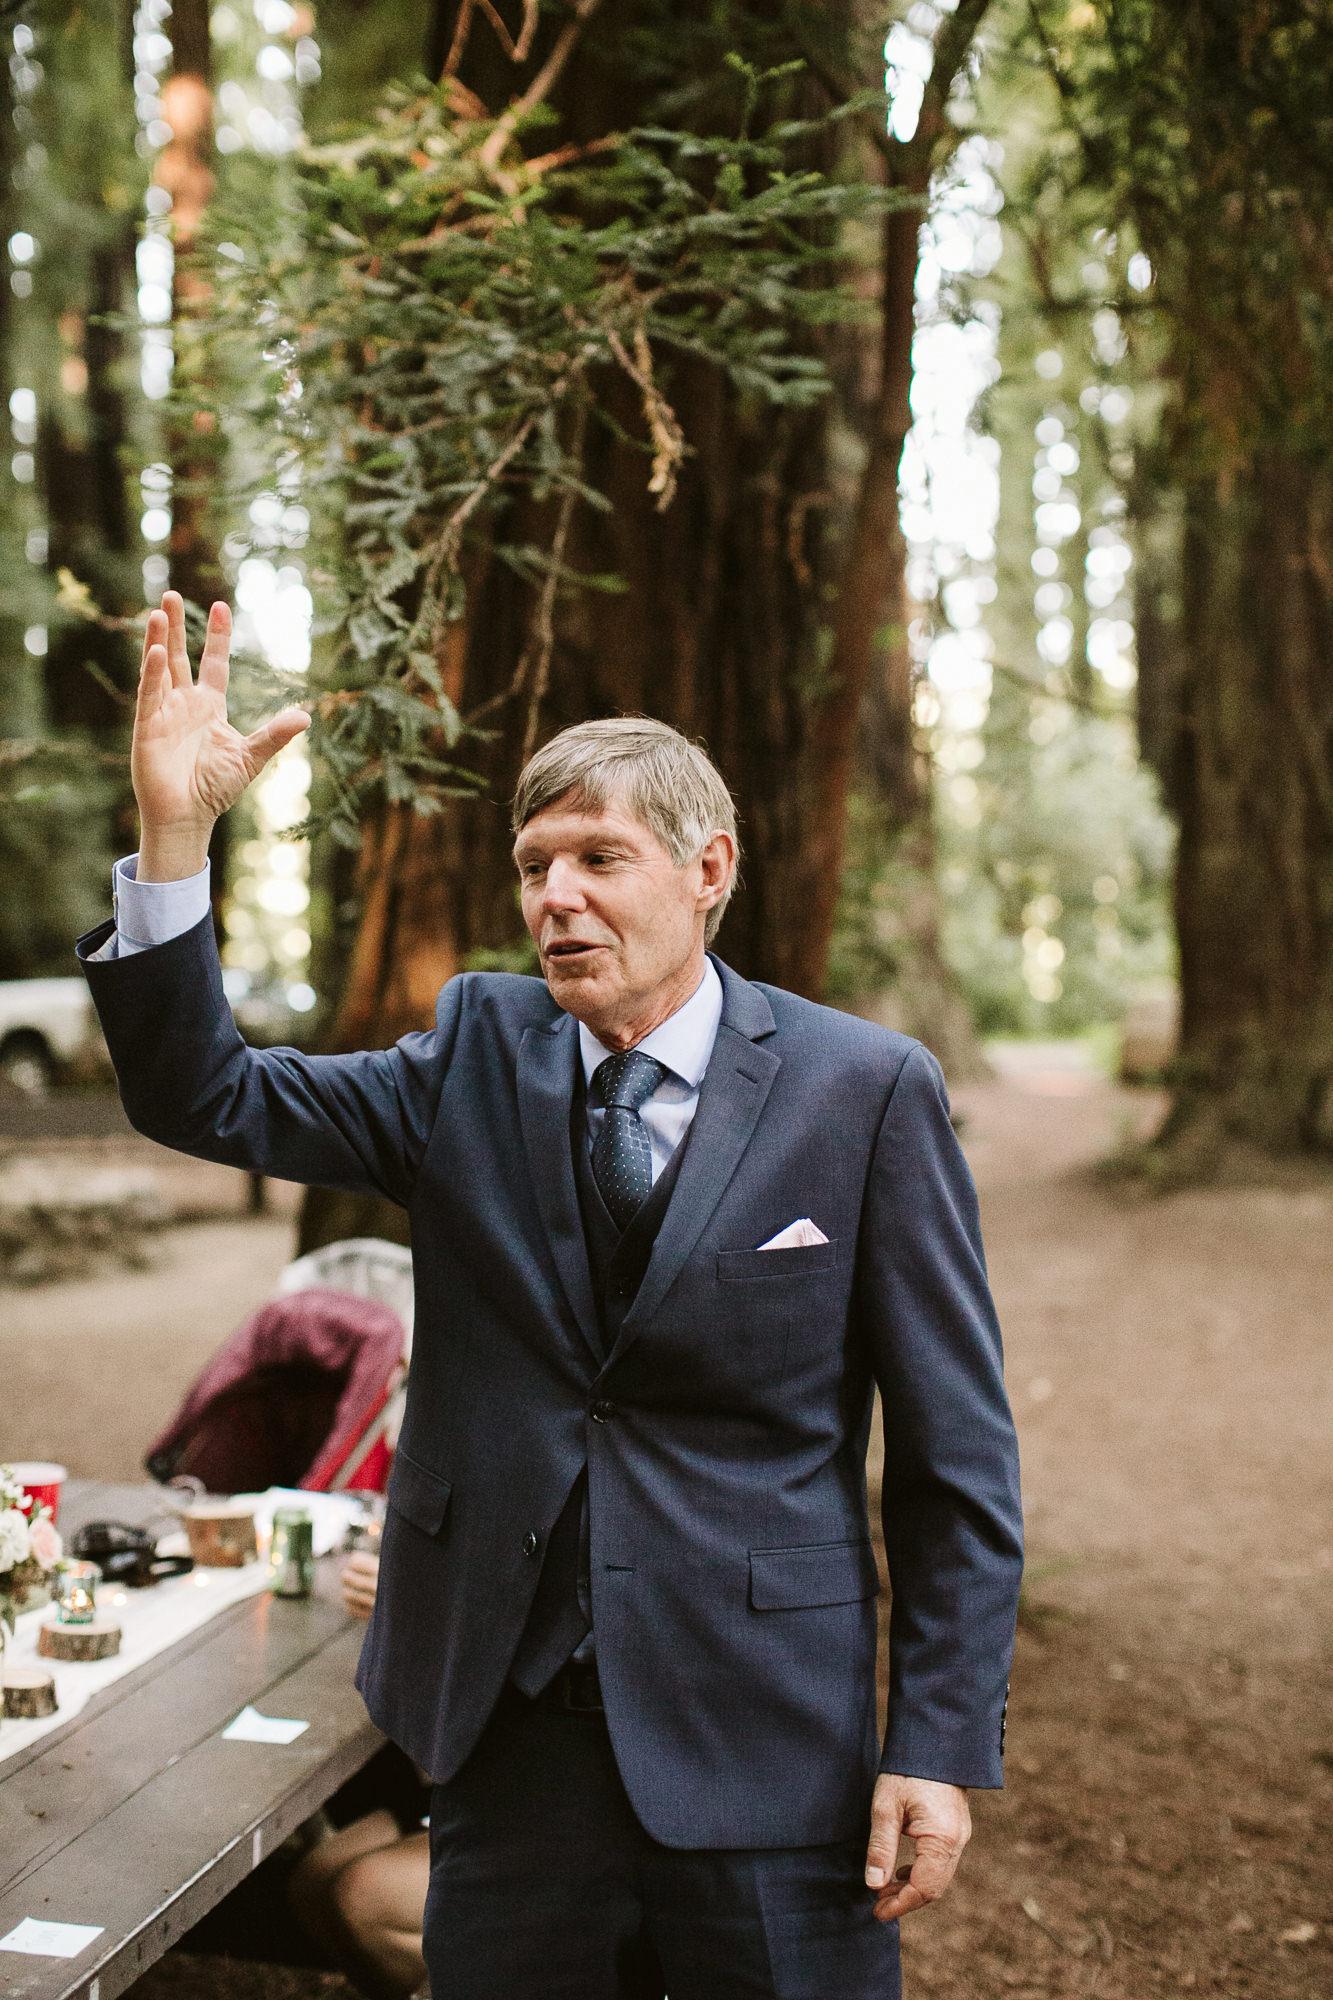 California-wedding-photographer-alfonso-flores-pamplin-groove-319.jpg